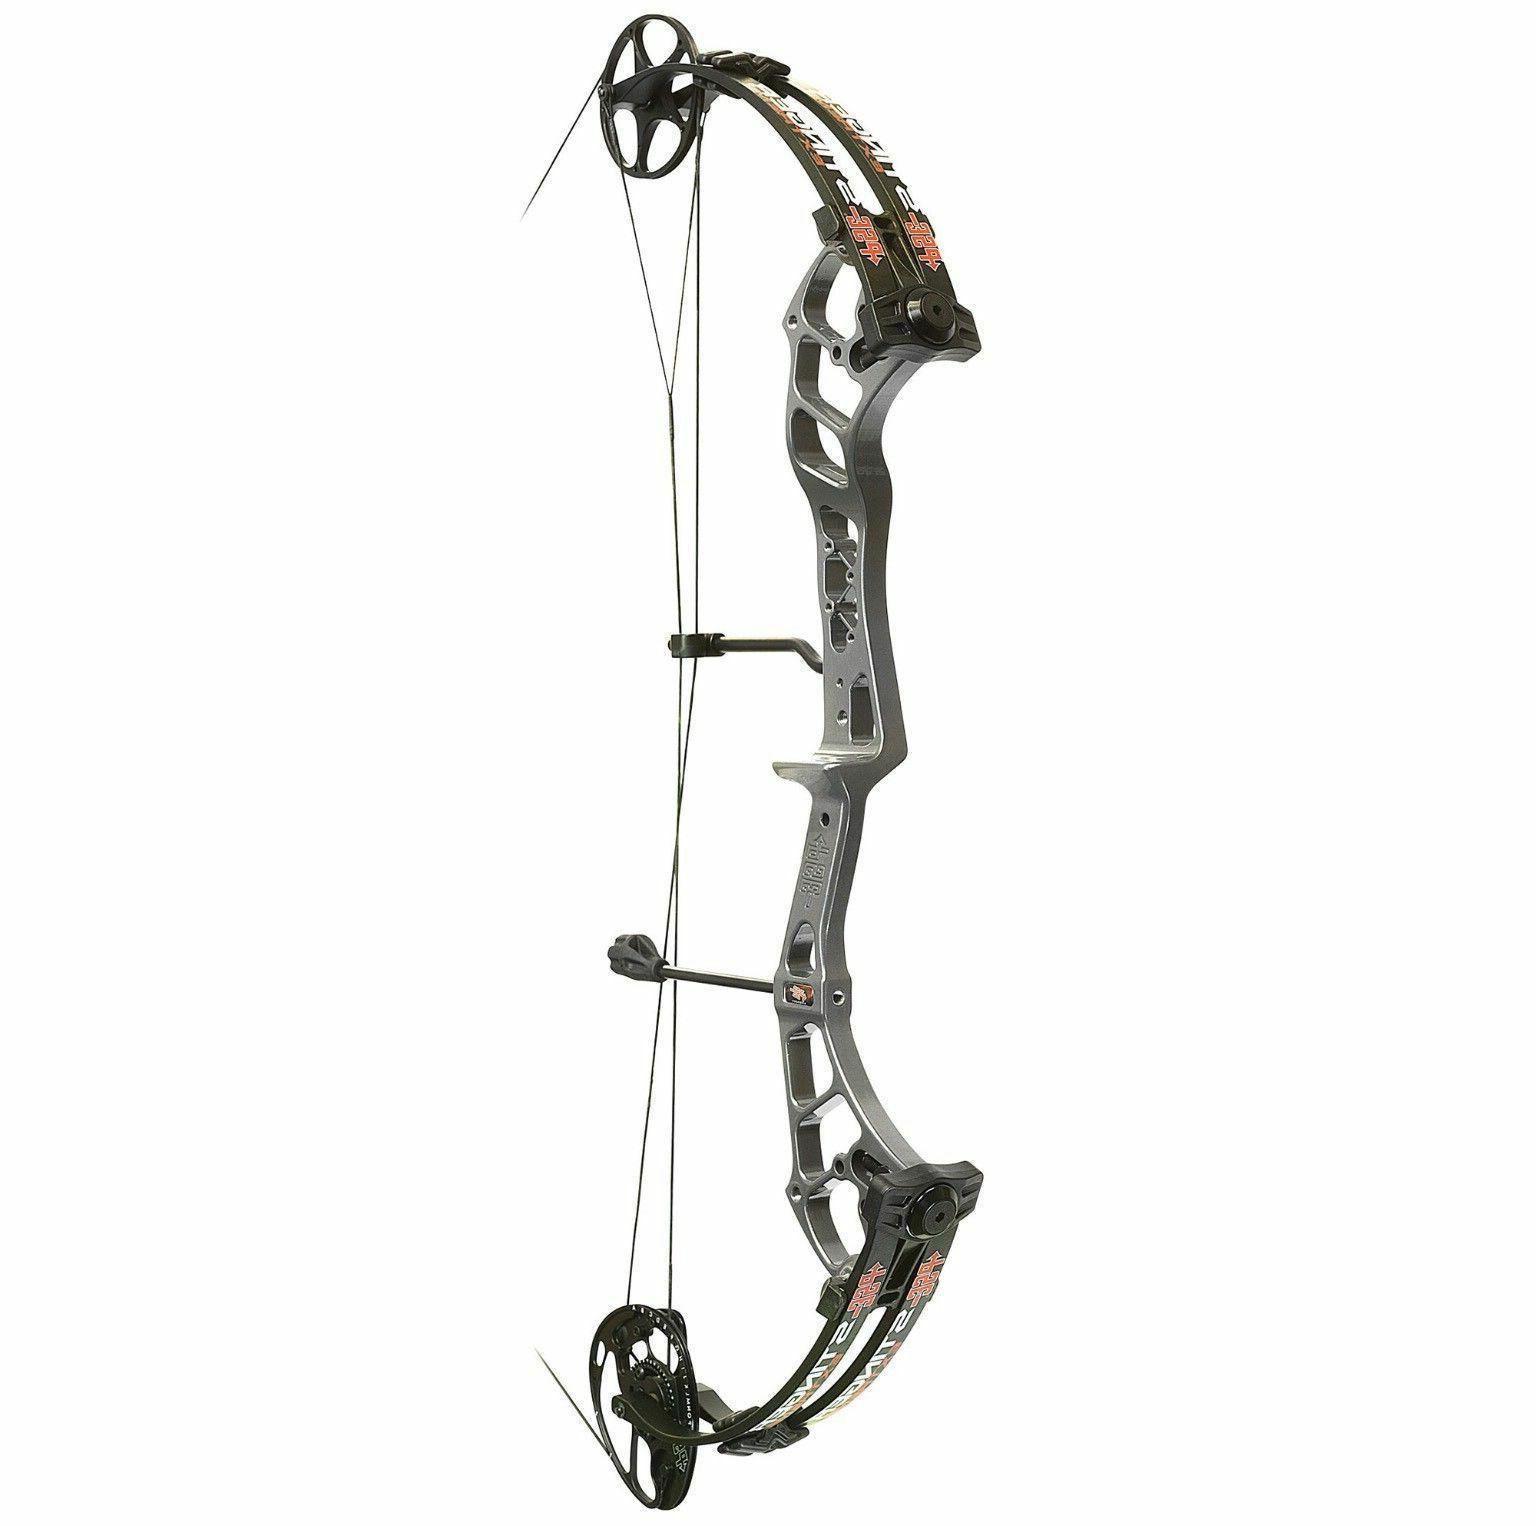 2018 PSE Archery Stinger Extreme 30-70lb Black Bow Only Bran